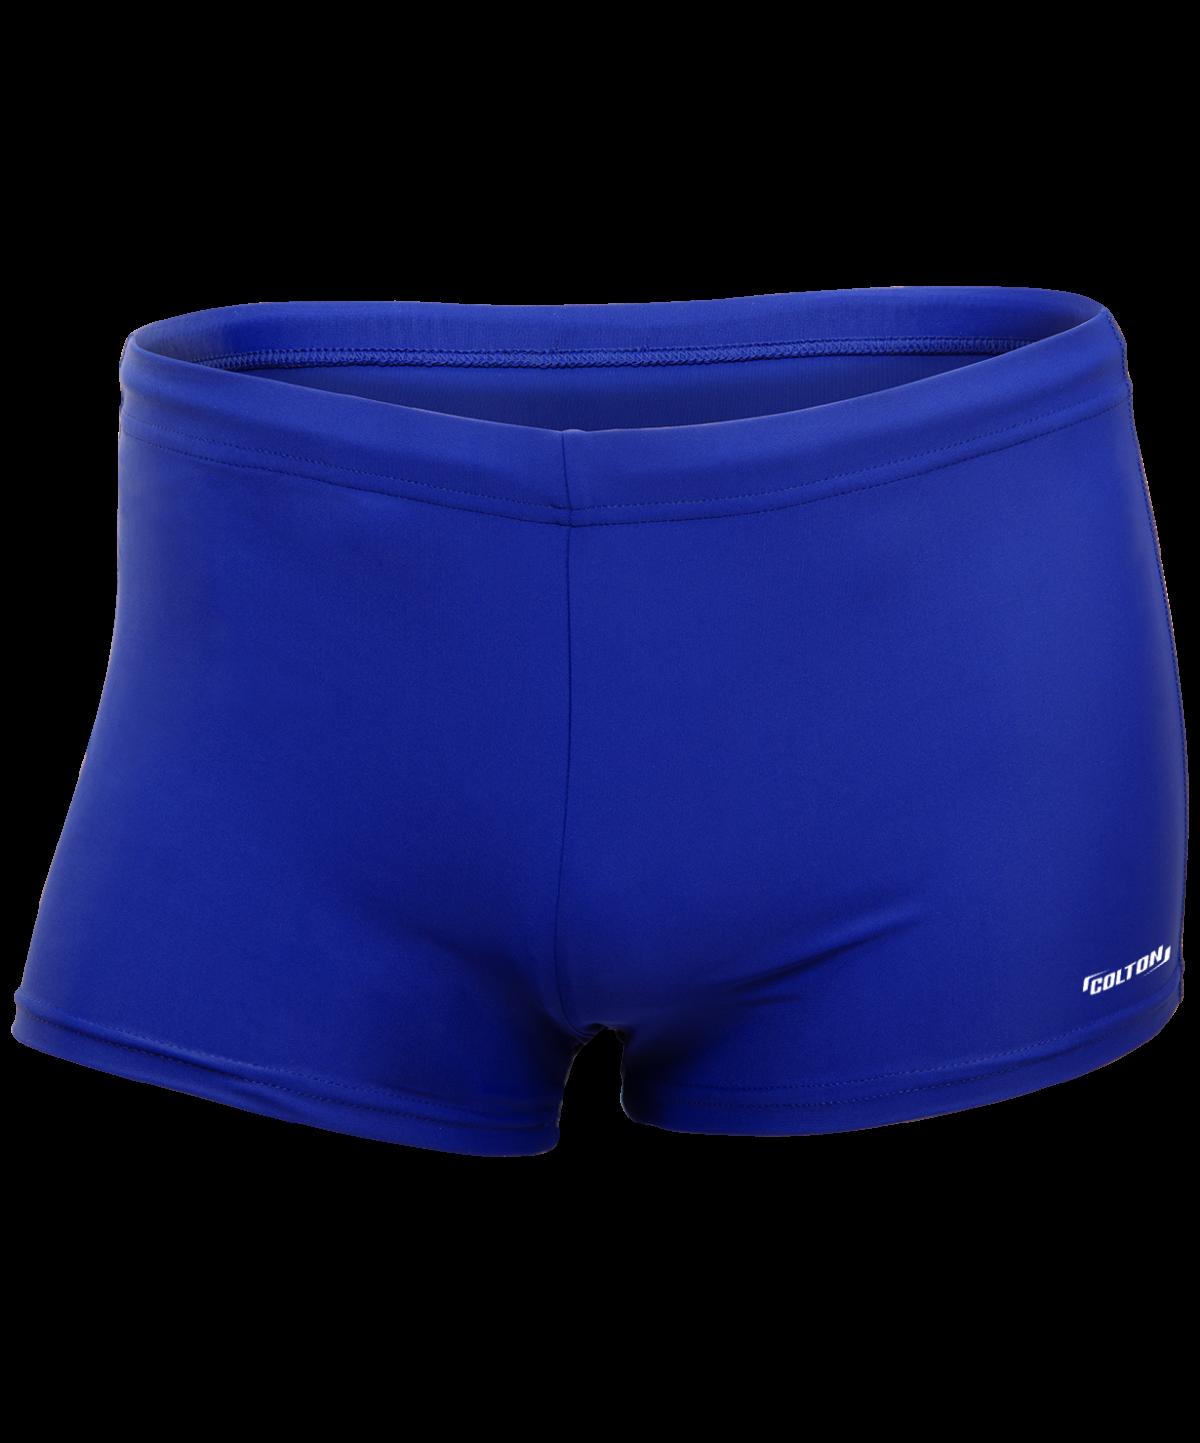 COLTON Simple Плавки-шорты детские (28-34)  SS-2984: синий - 1